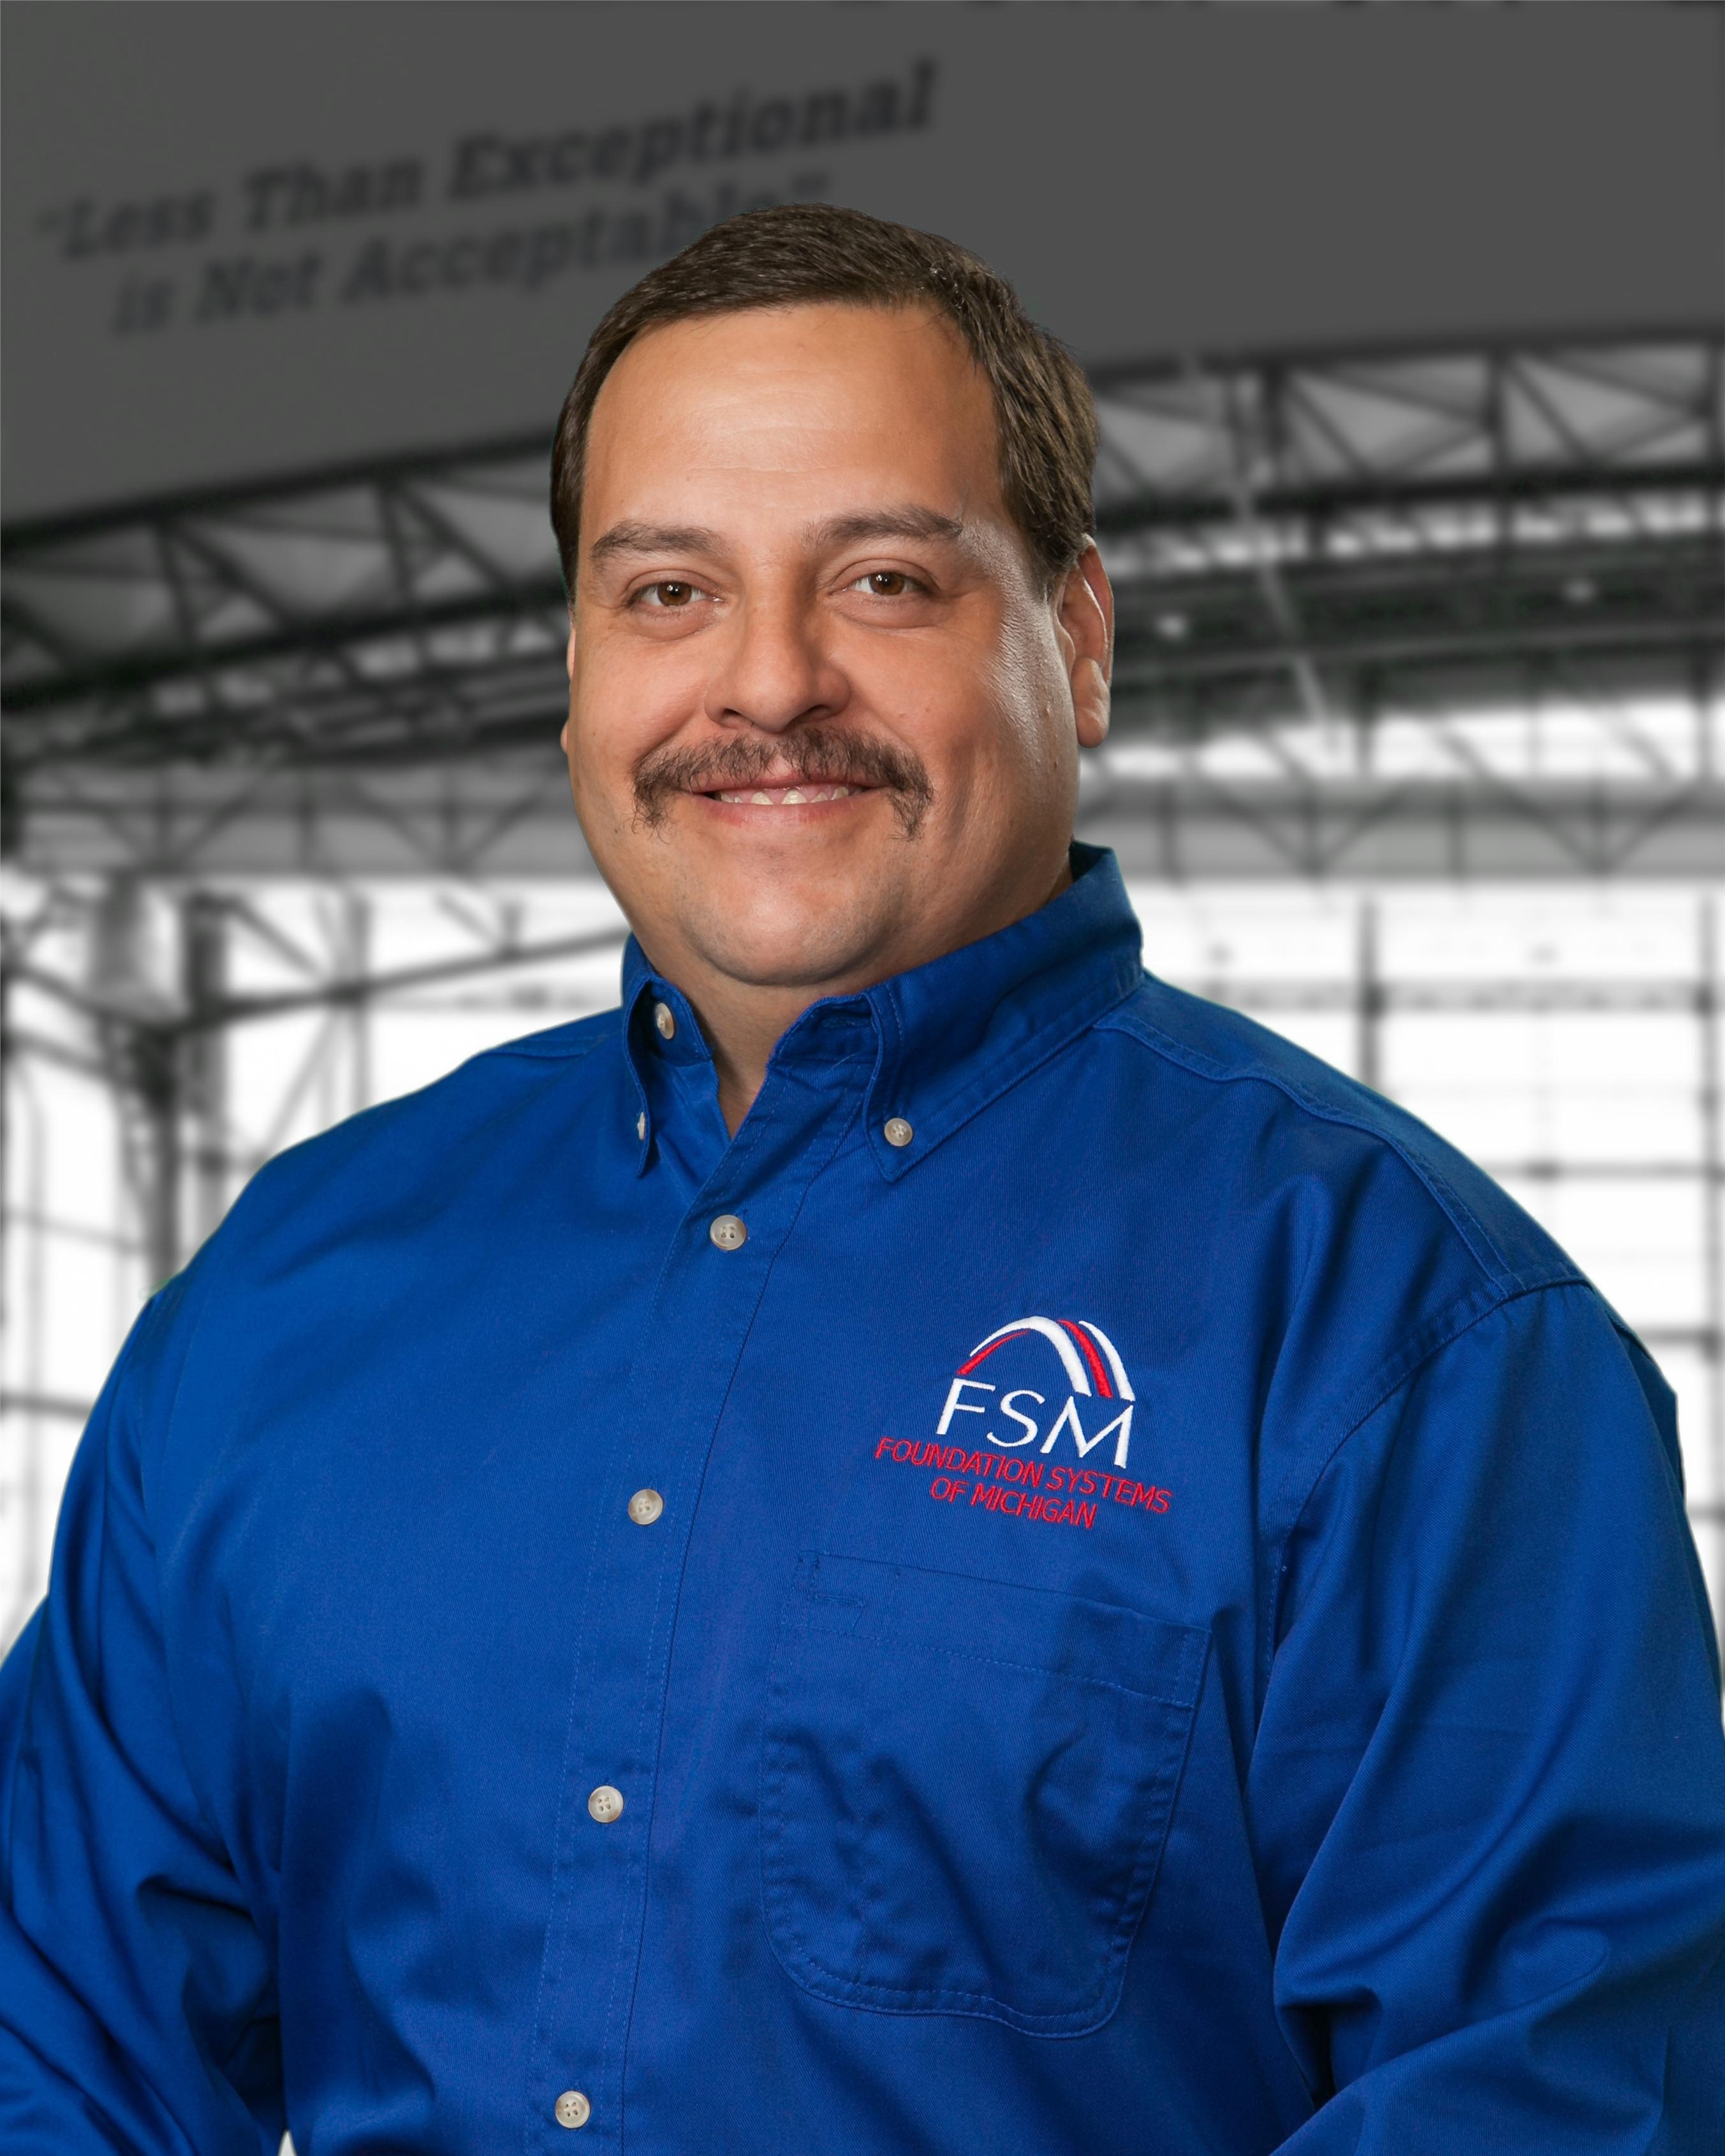 FSM Salvador Ramirez Foreman